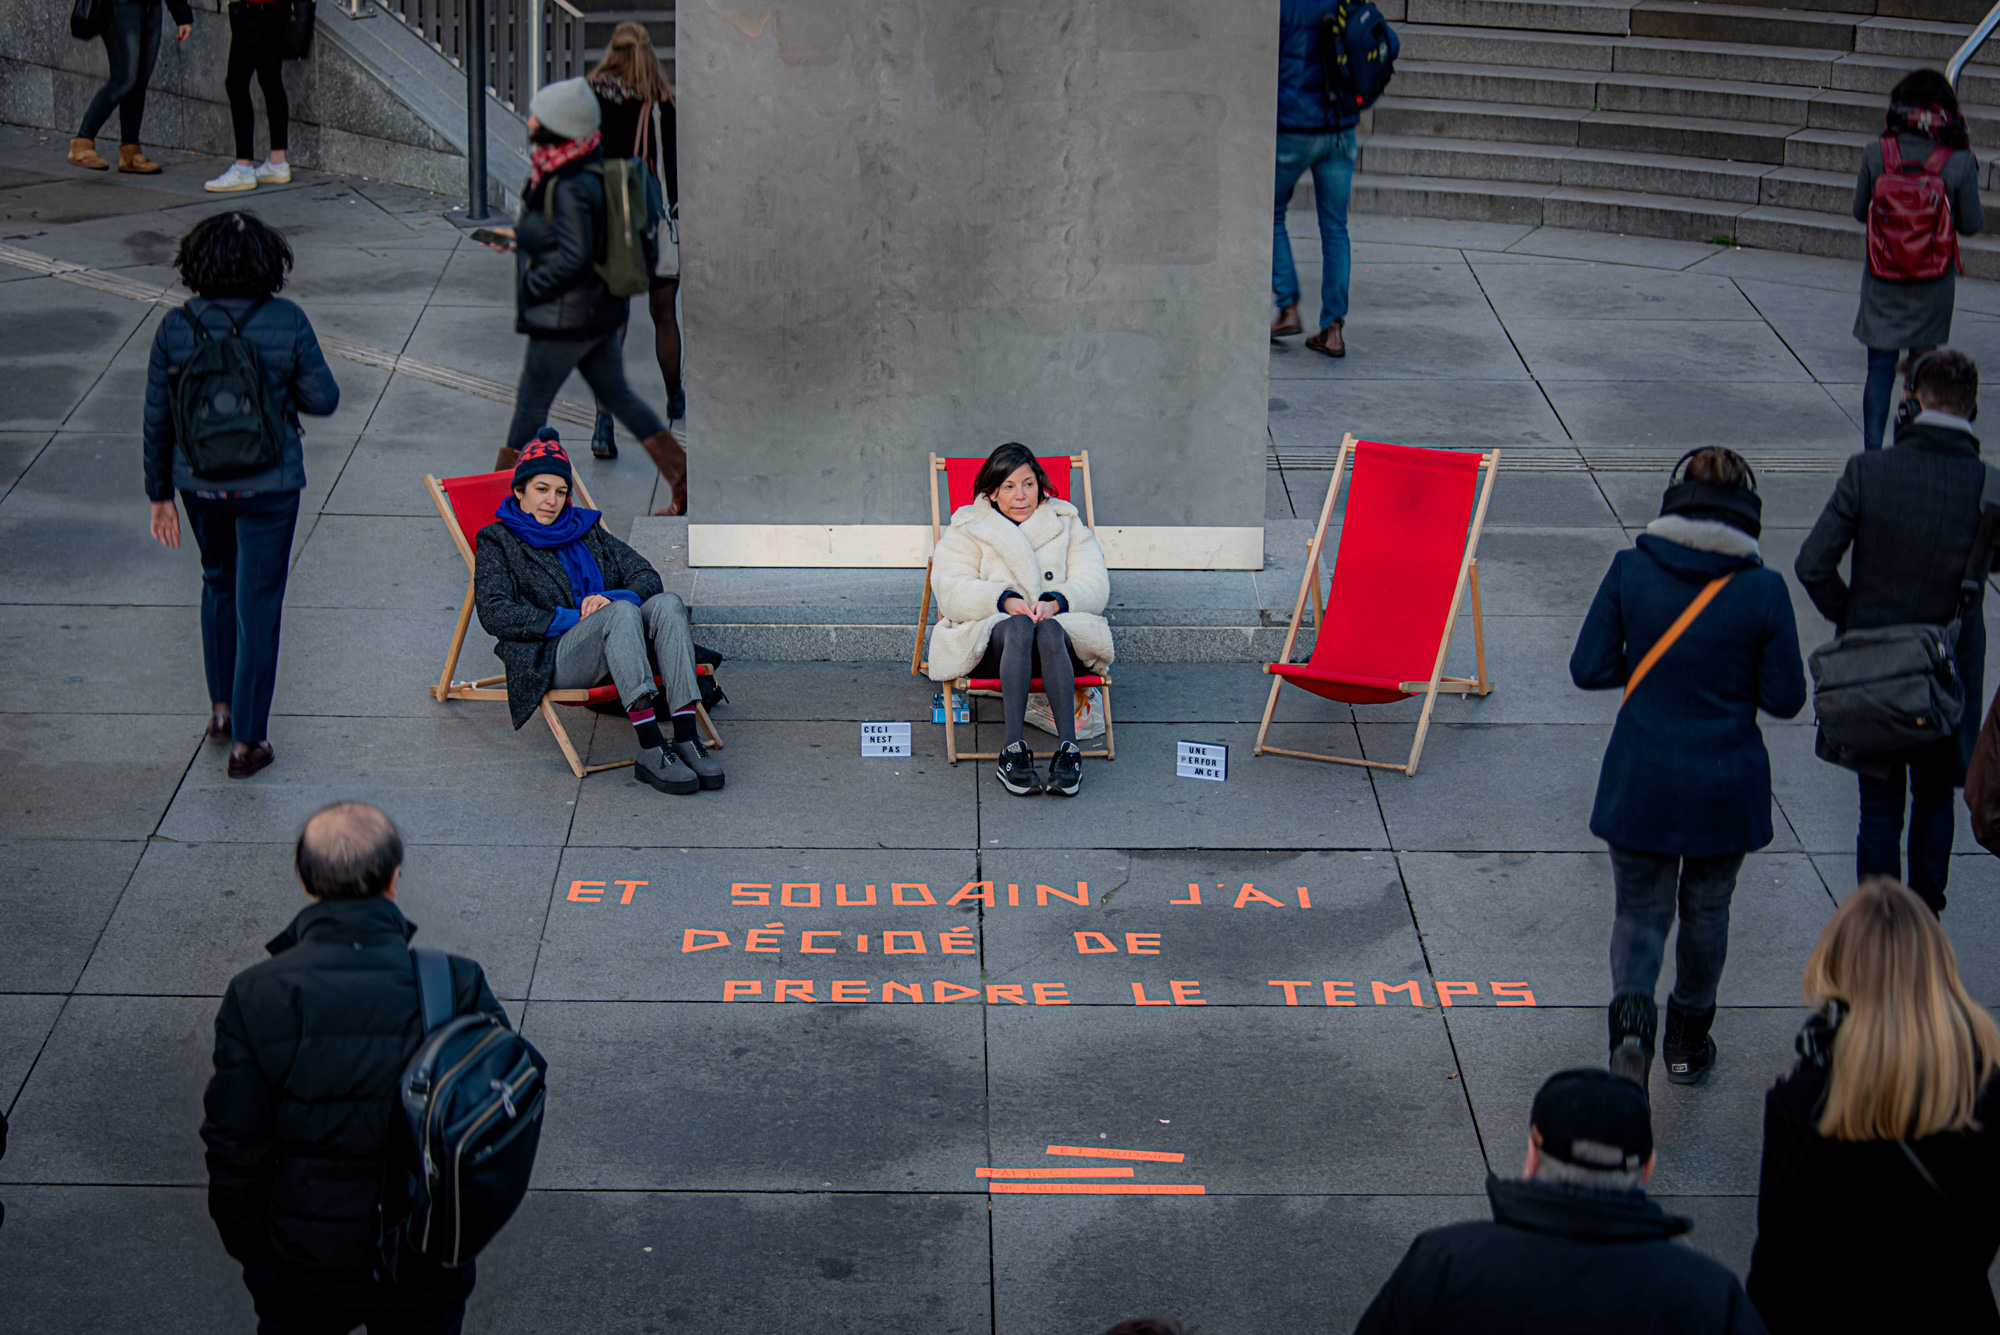 KISS : La Défense 21.01.20 - Nice To Meet You Cie - © Emilie Munck Montuclard